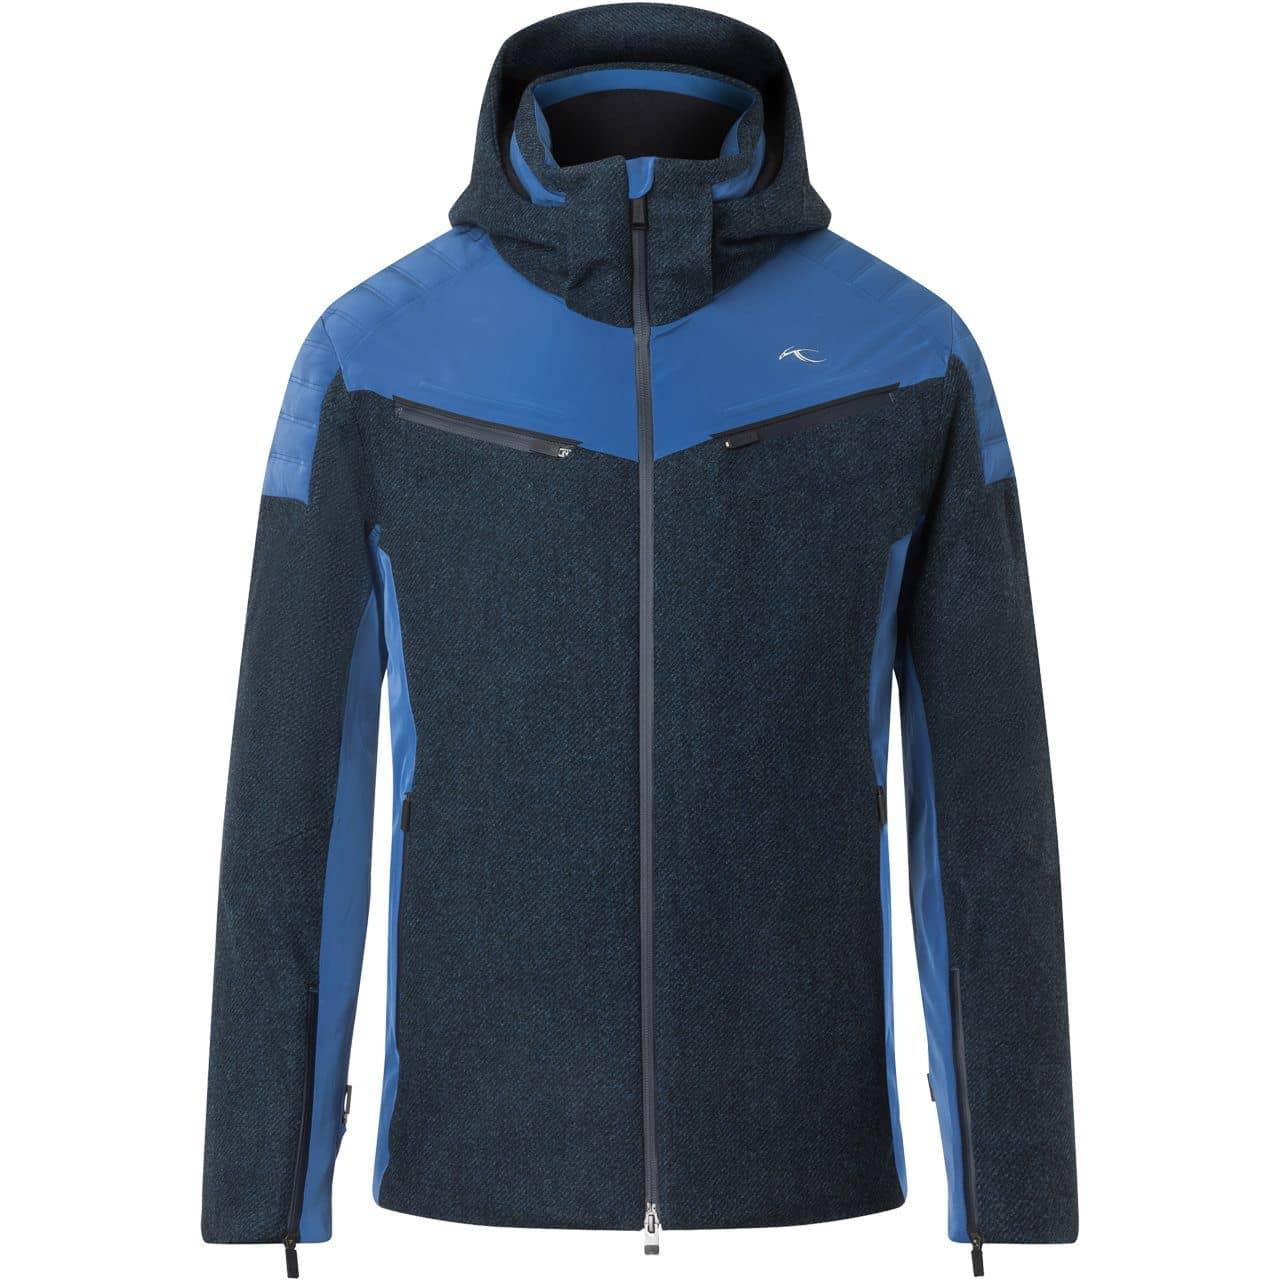 Kjus Men Jacket FORMULA S.E. atlanta blue/southern blue - 54